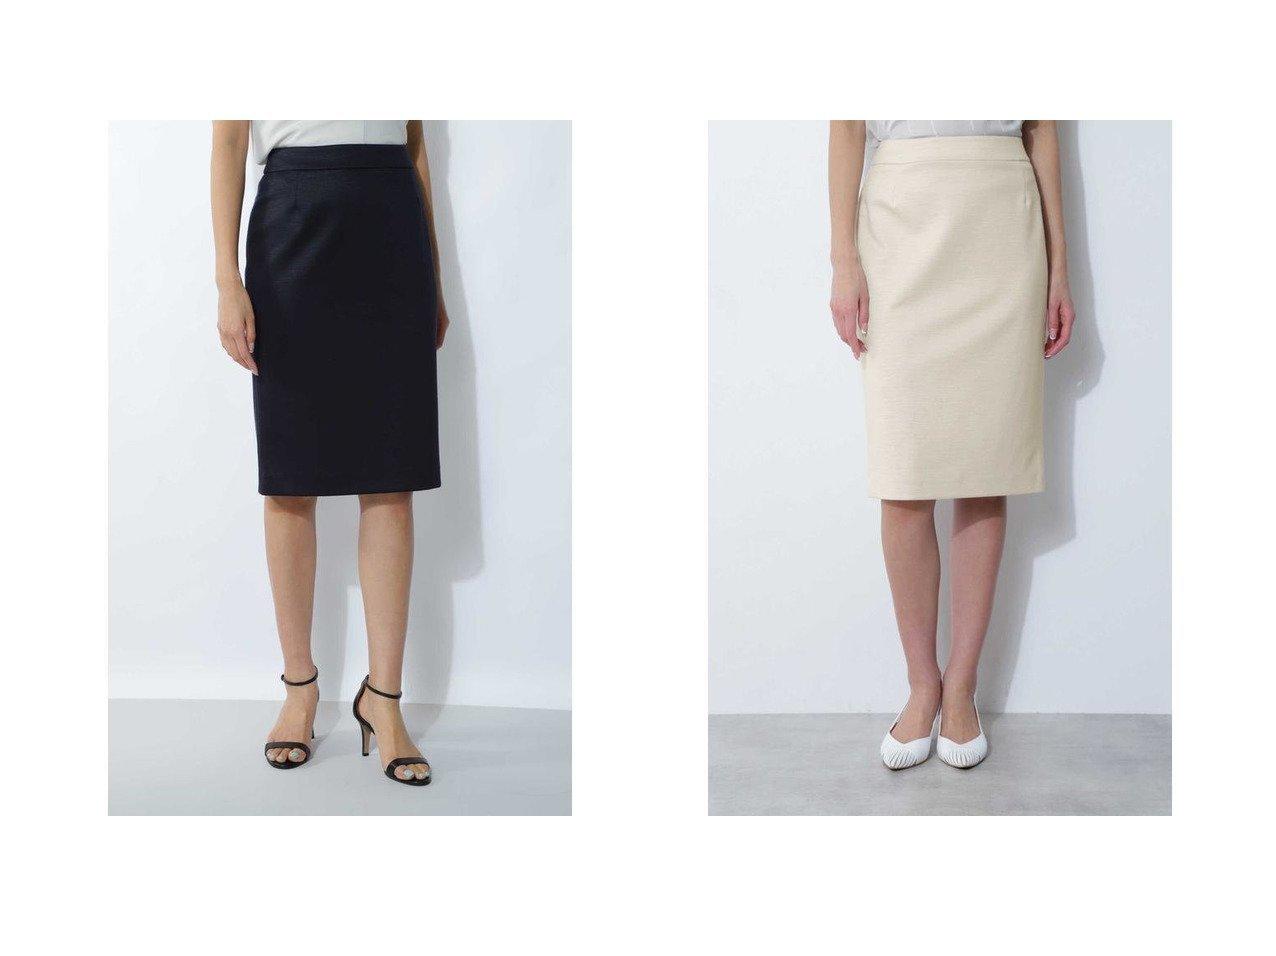 【BOSCH/ボッシュ】のモクロディセットアップスカート BOSCHのおすすめ!人気、トレンド・レディースファッションの通販 おすすめで人気の流行・トレンド、ファッションの通販商品 メンズファッション・キッズファッション・インテリア・家具・レディースファッション・服の通販 founy(ファニー) https://founy.com/ ファッション Fashion レディースファッション WOMEN セットアップ Setup スカート Skirt セットアップ タイトスカート ポケット 定番 Standard |ID:crp329100000019952